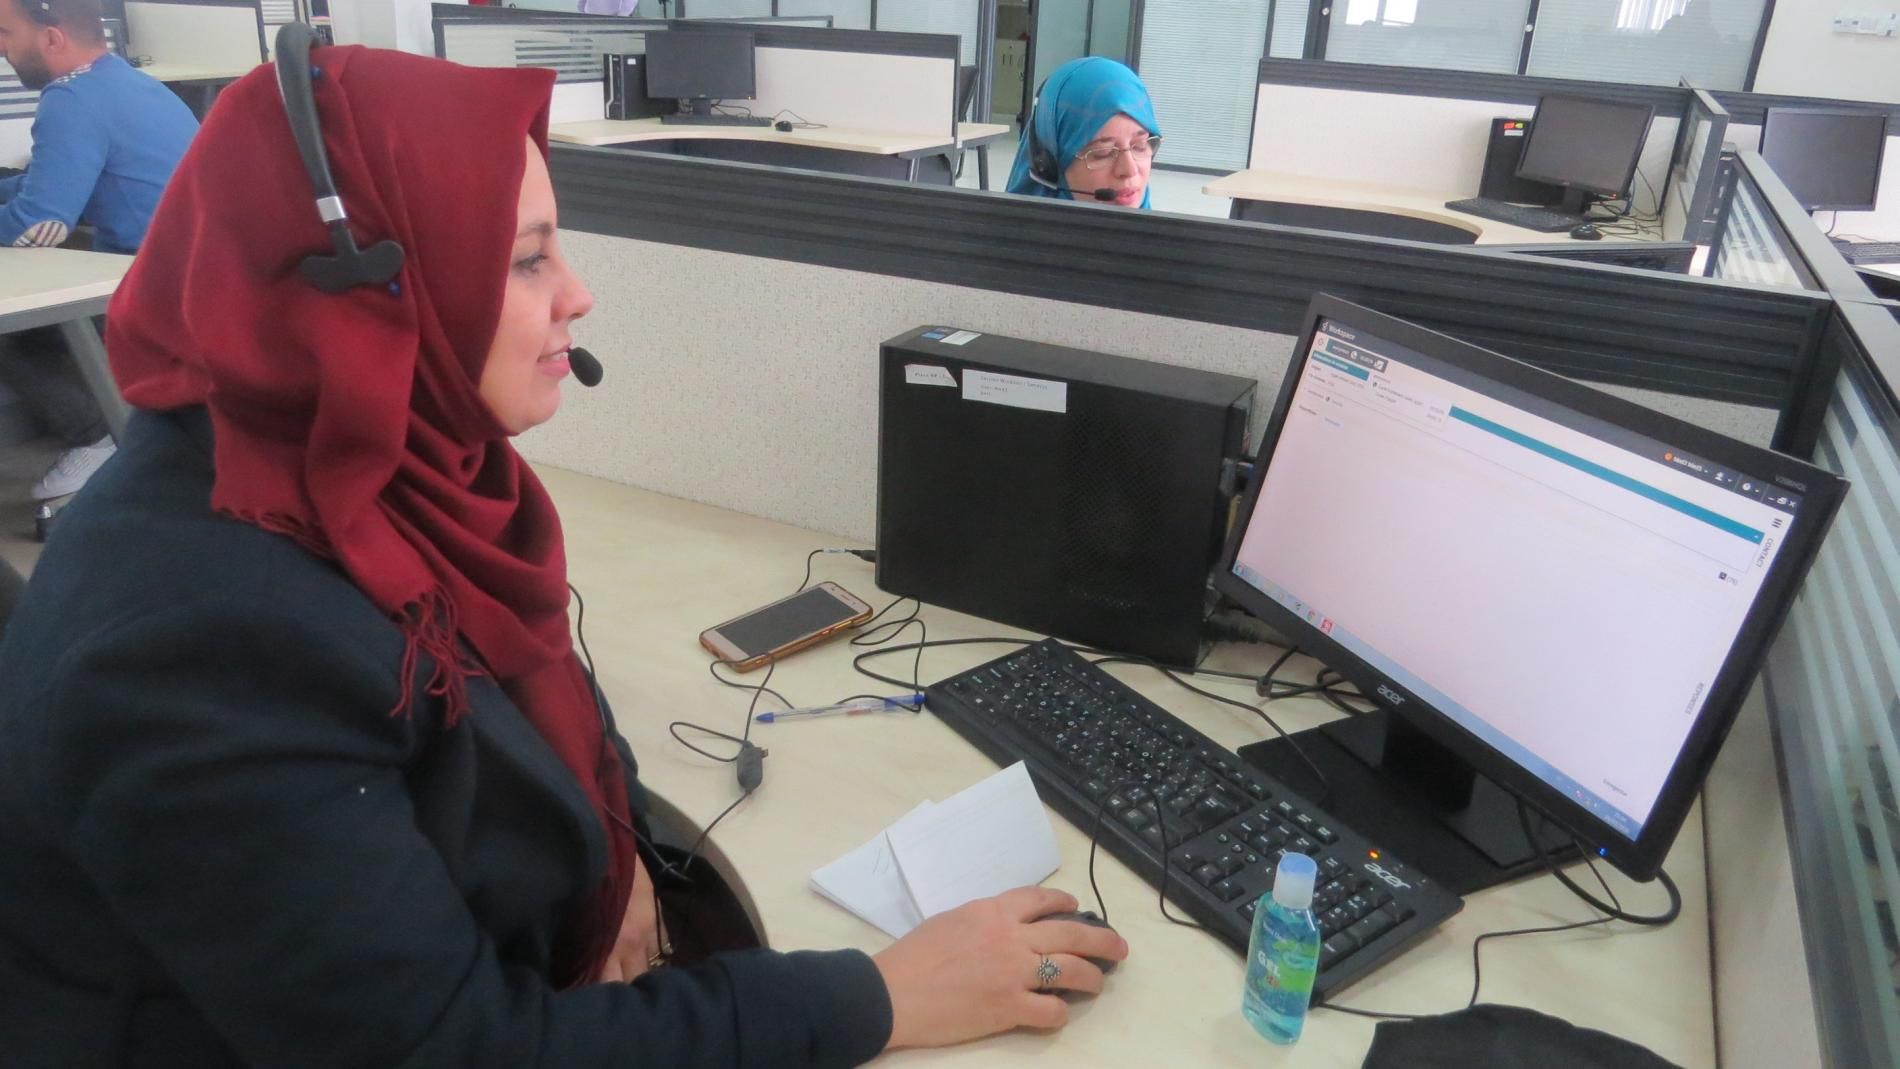 Algeria's COVID-19 hotline props up rapid response